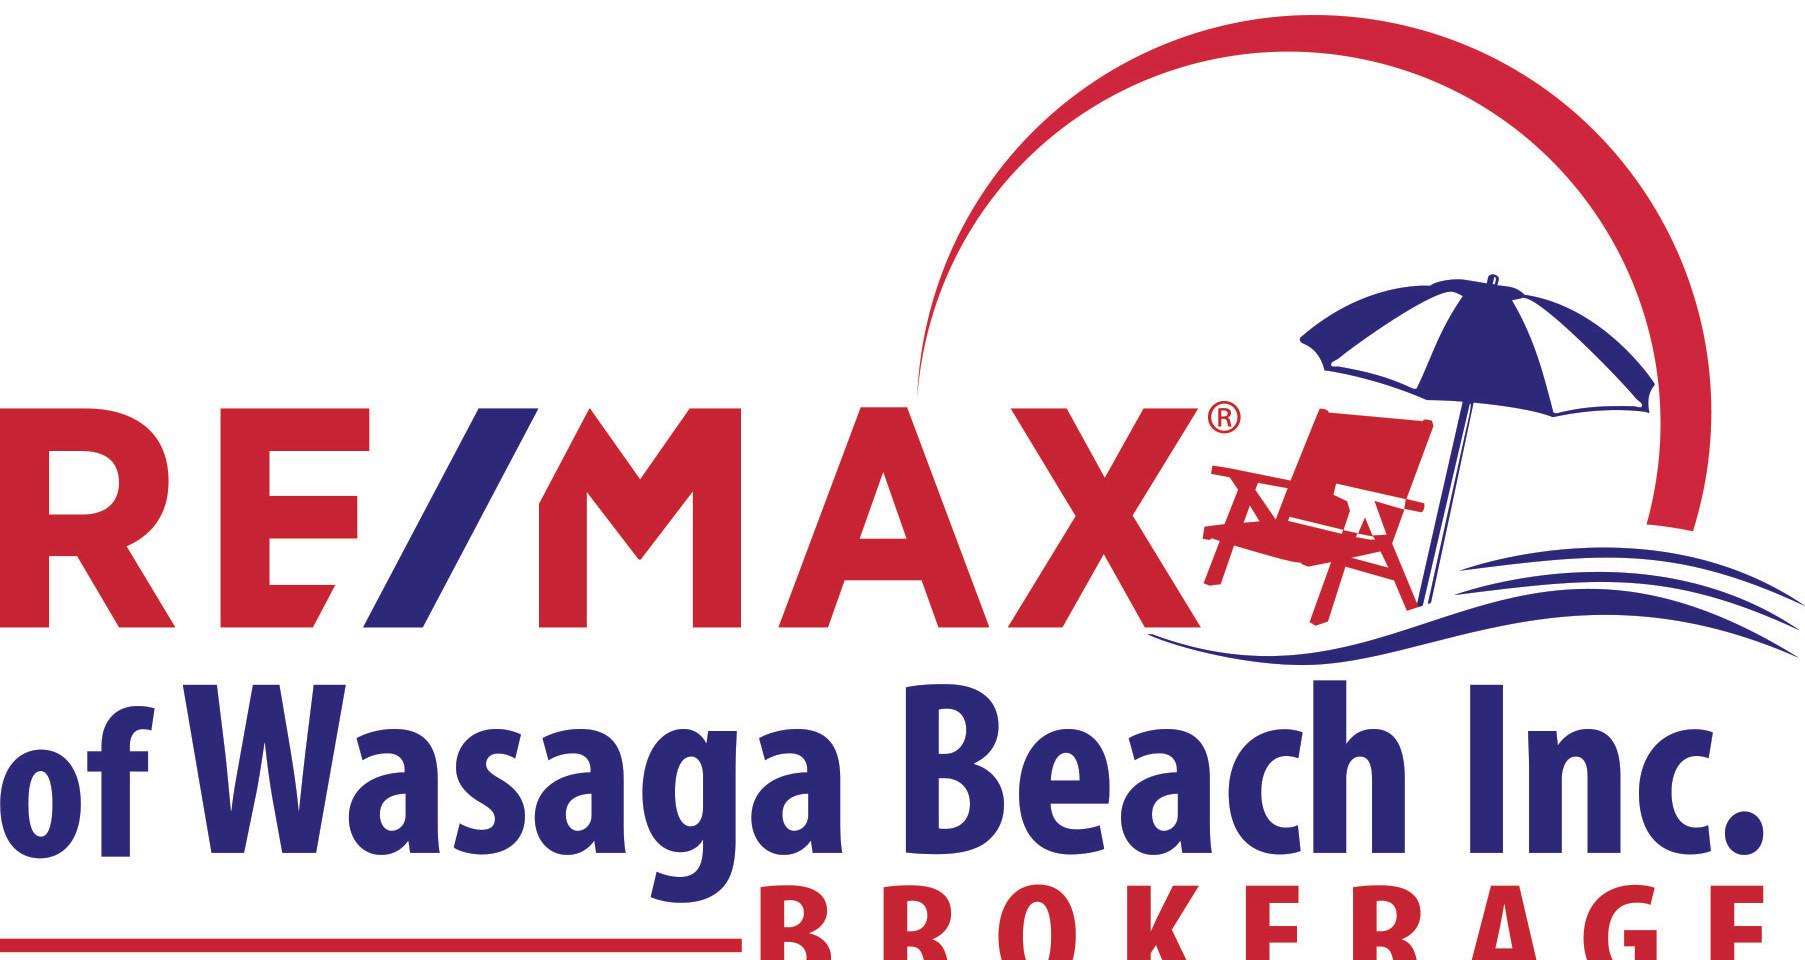 REMAX-of-Wasaga-Beach-LOGO_new.jpg